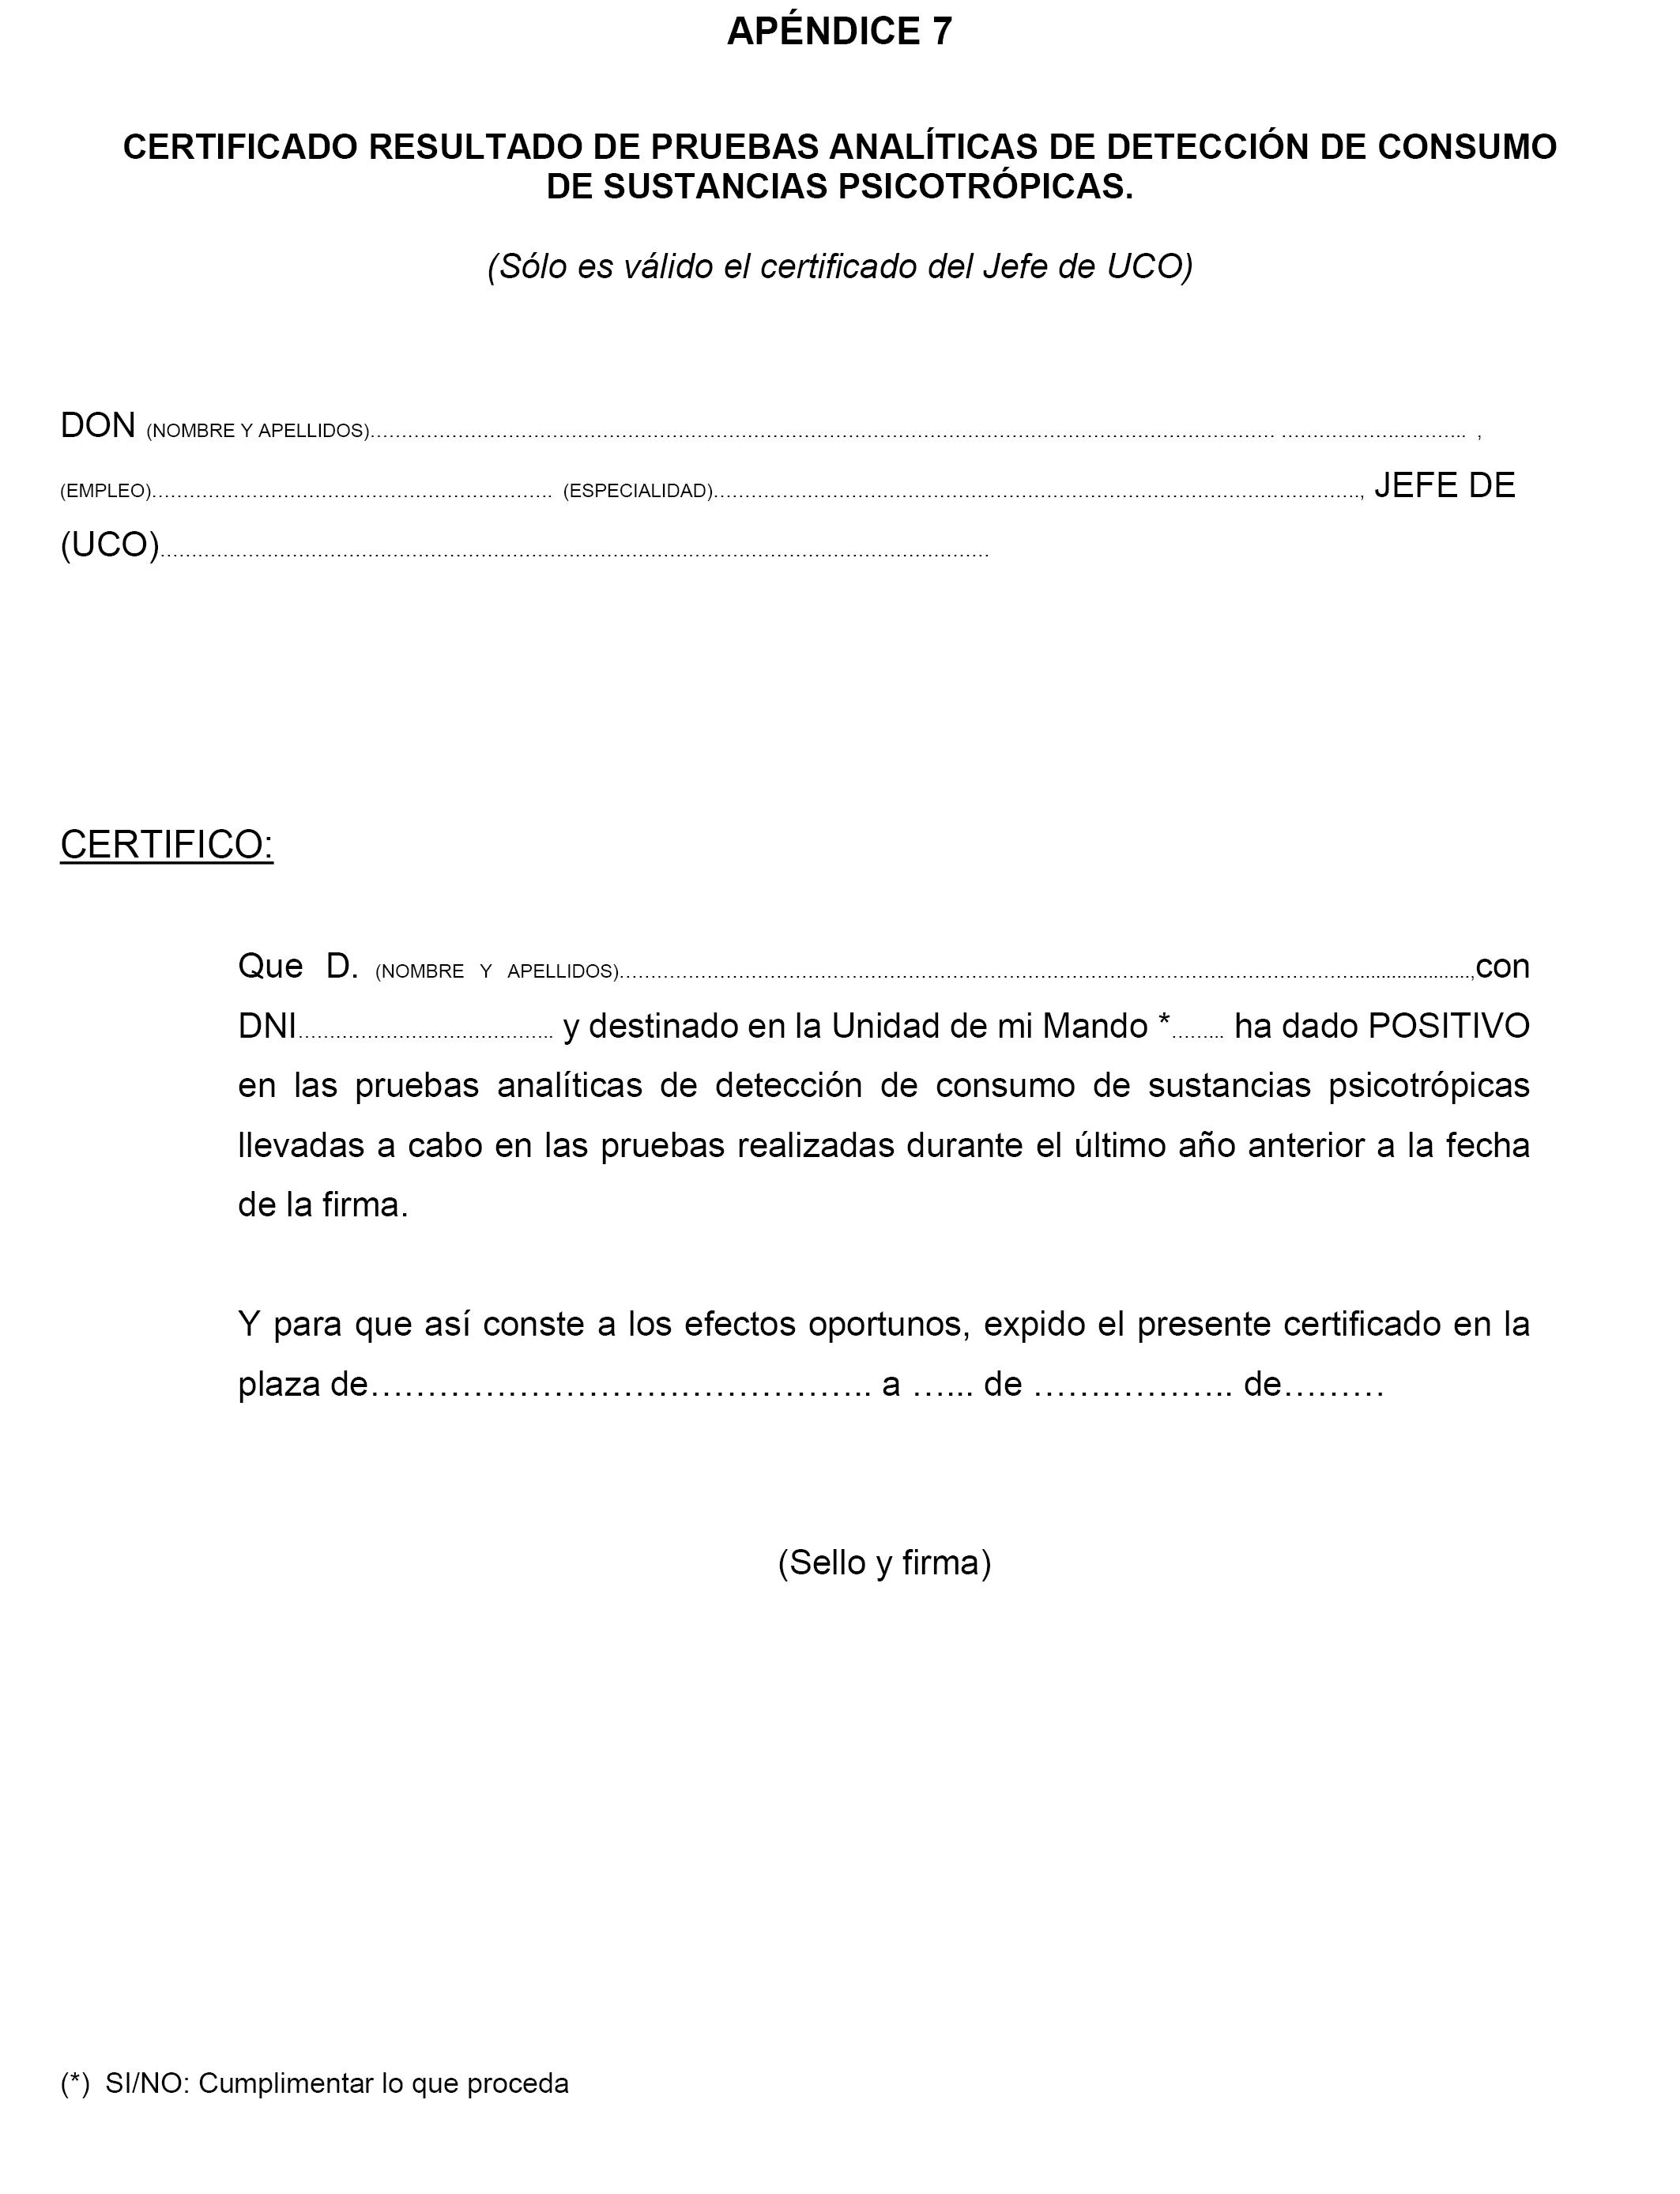 BOE.es - Documento BOE-A-2016-4869